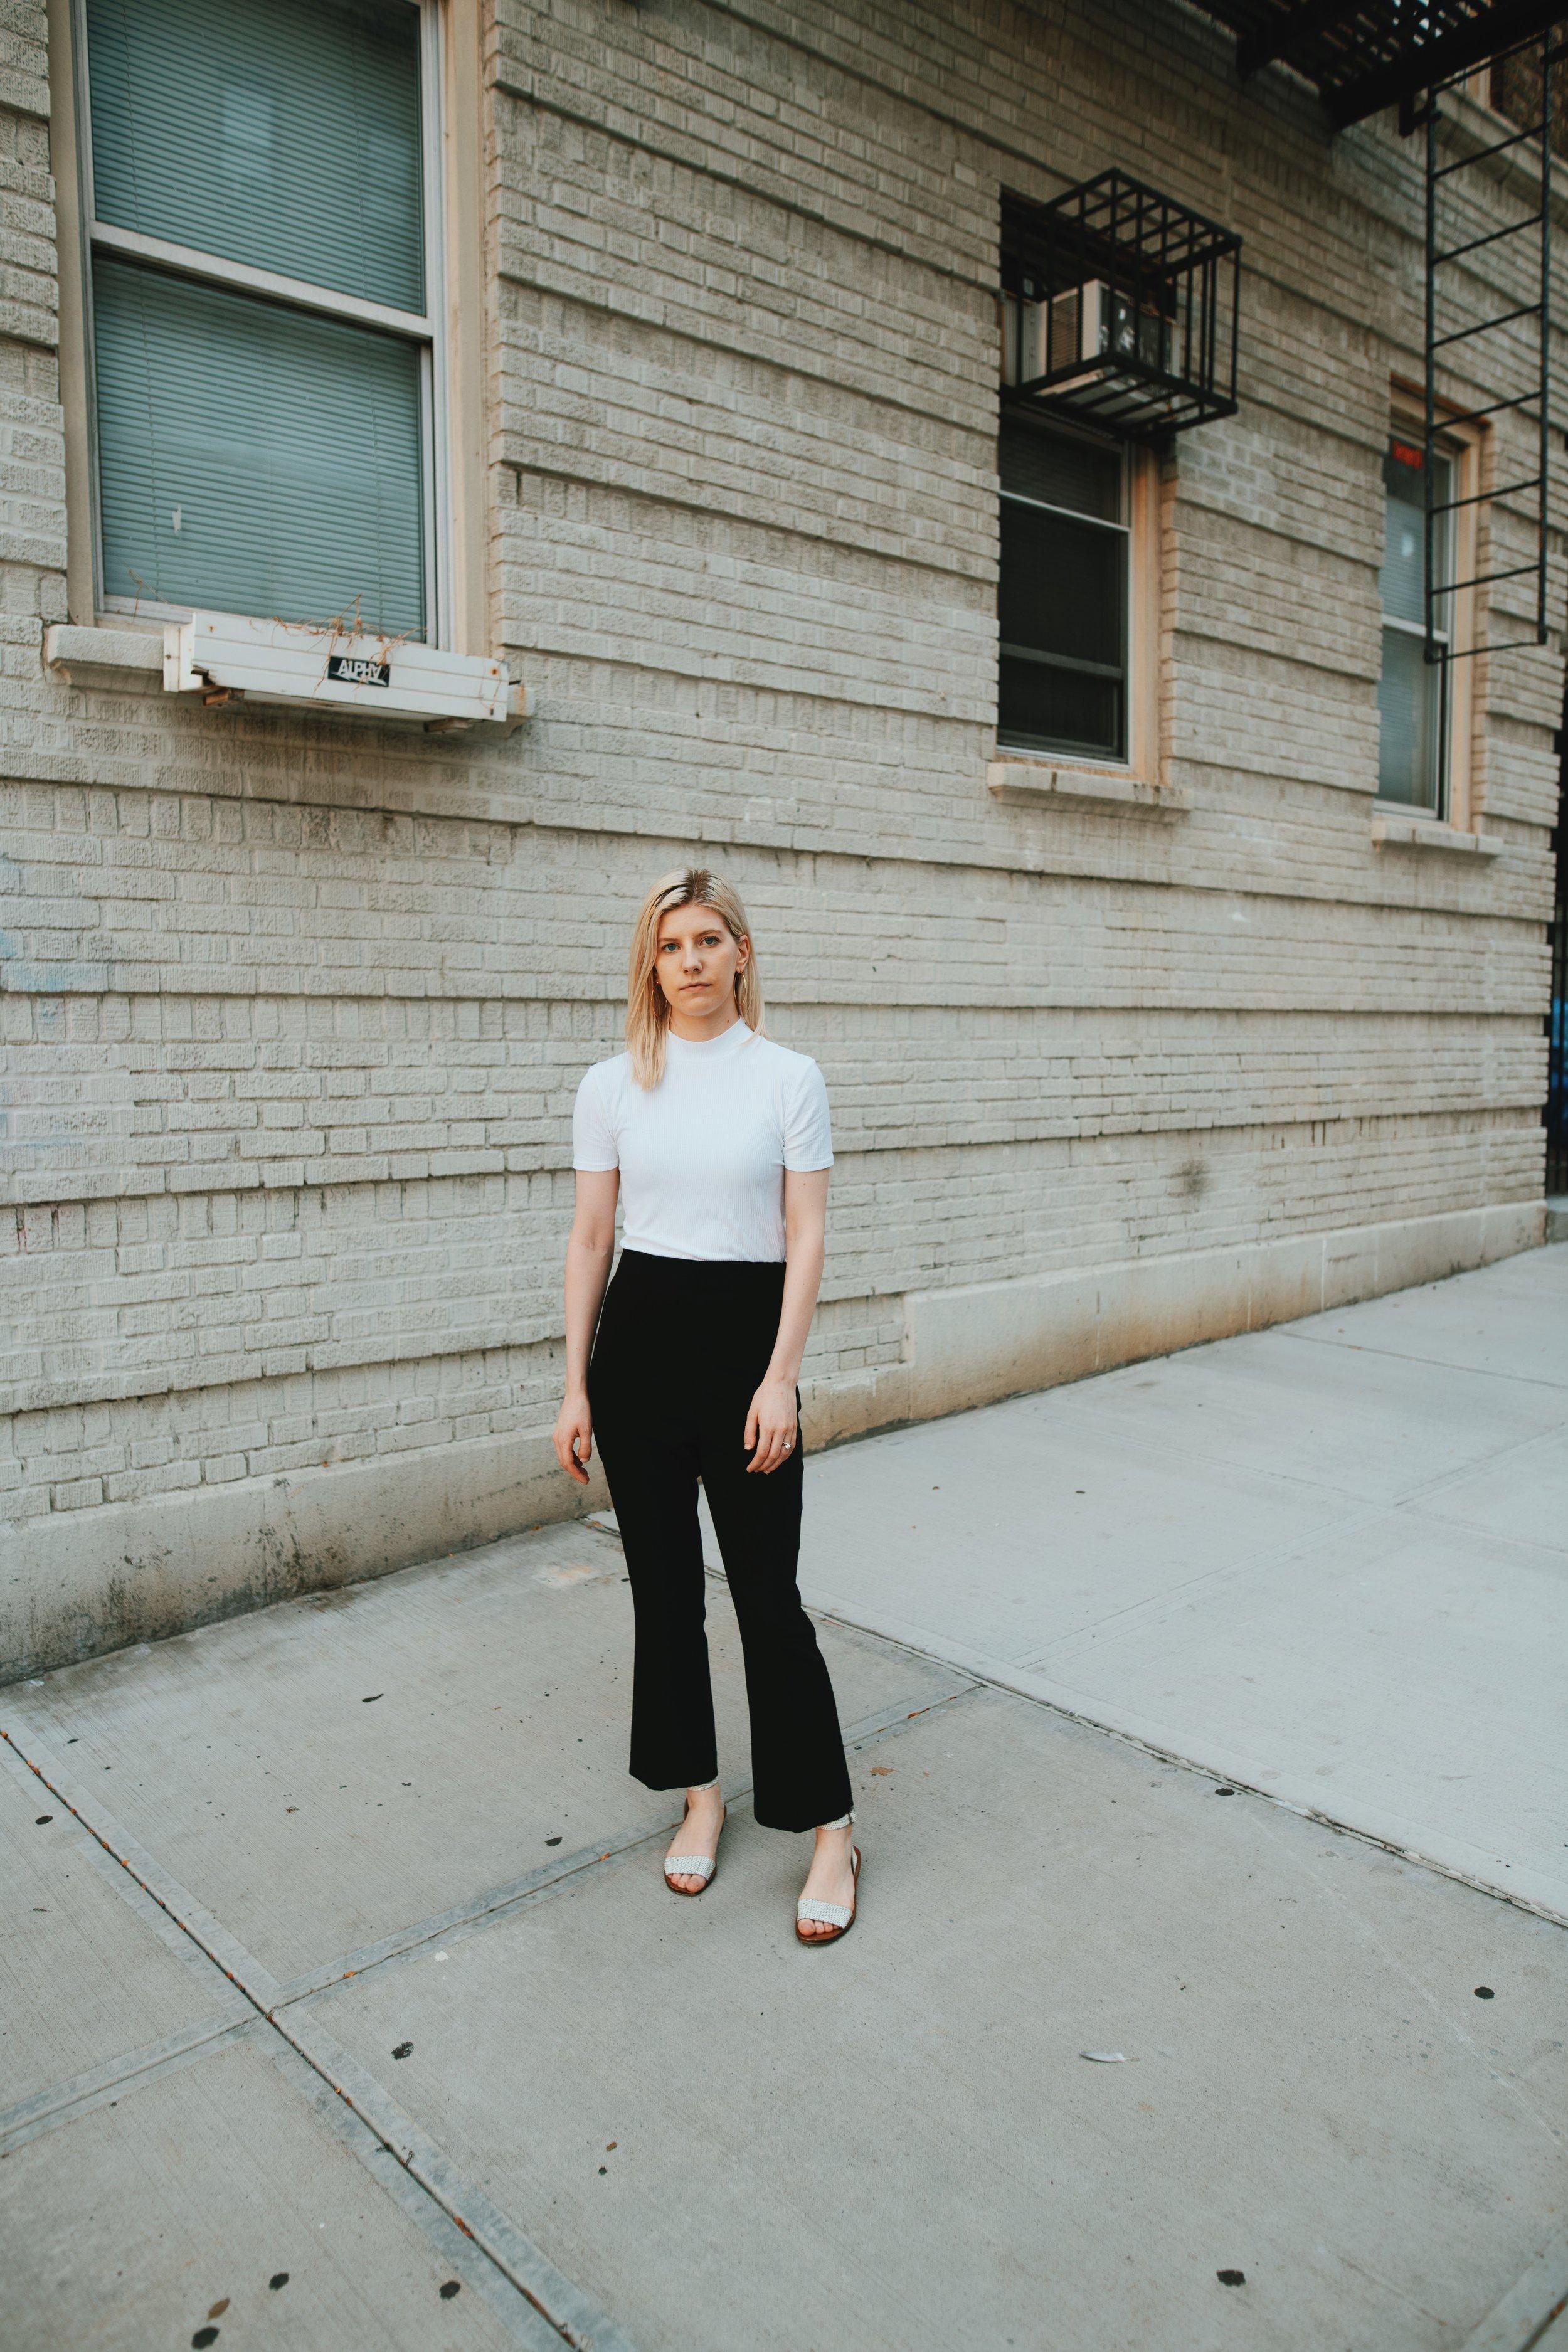 Washington Heights, Manhattan  September 2018